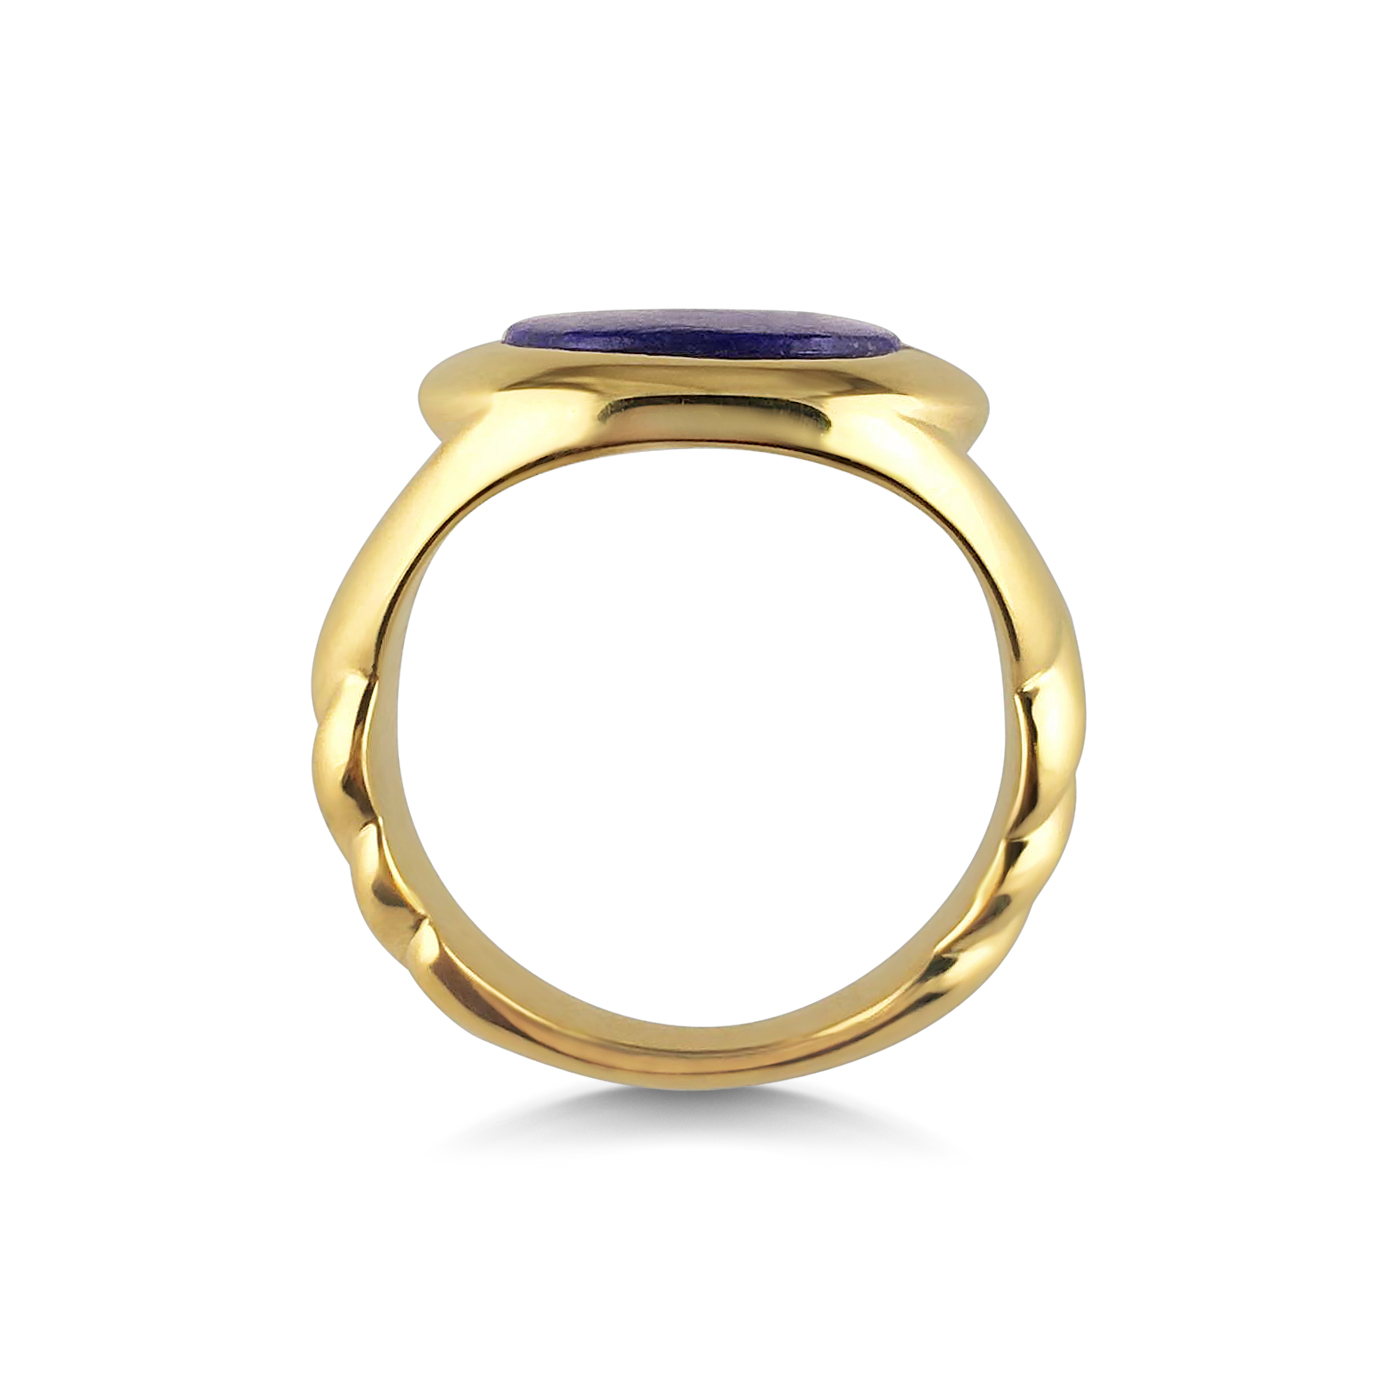 18ct-yellow-gold-and-lapis-signet-ring-2.jpg